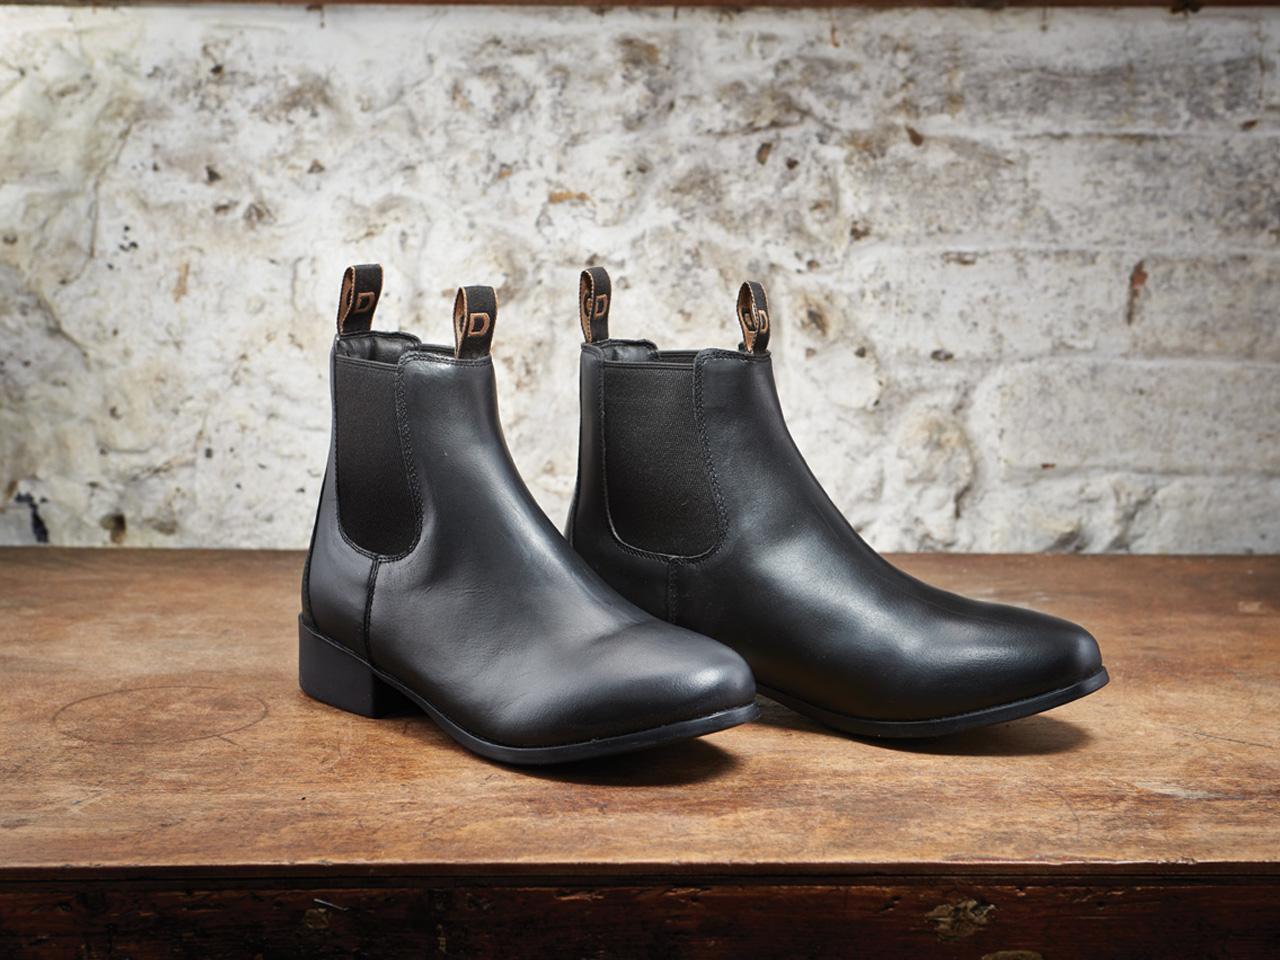 Dublin Stiefel,All Foundation Jodhpur Stiefel,All Dublin Colours/Größes,Quality Leder, New bdd0a8